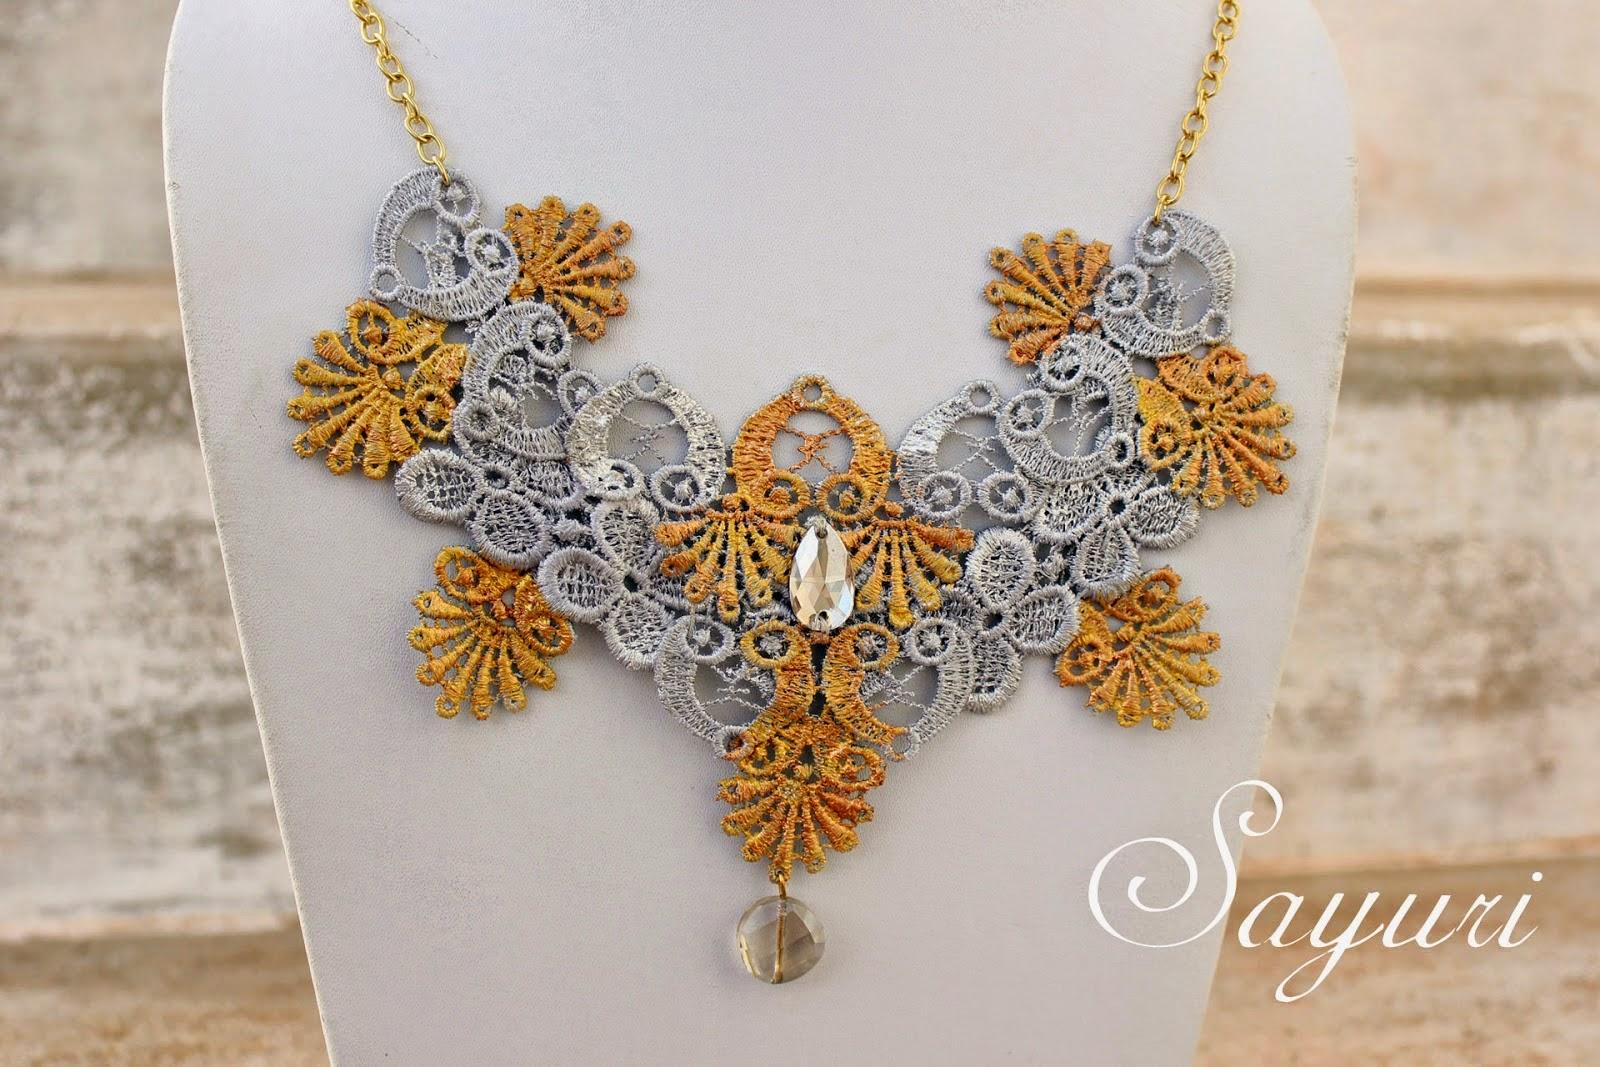 http://www.jewelsofsayuri.com/2014/08/metallic-lace-necklace-diy.html